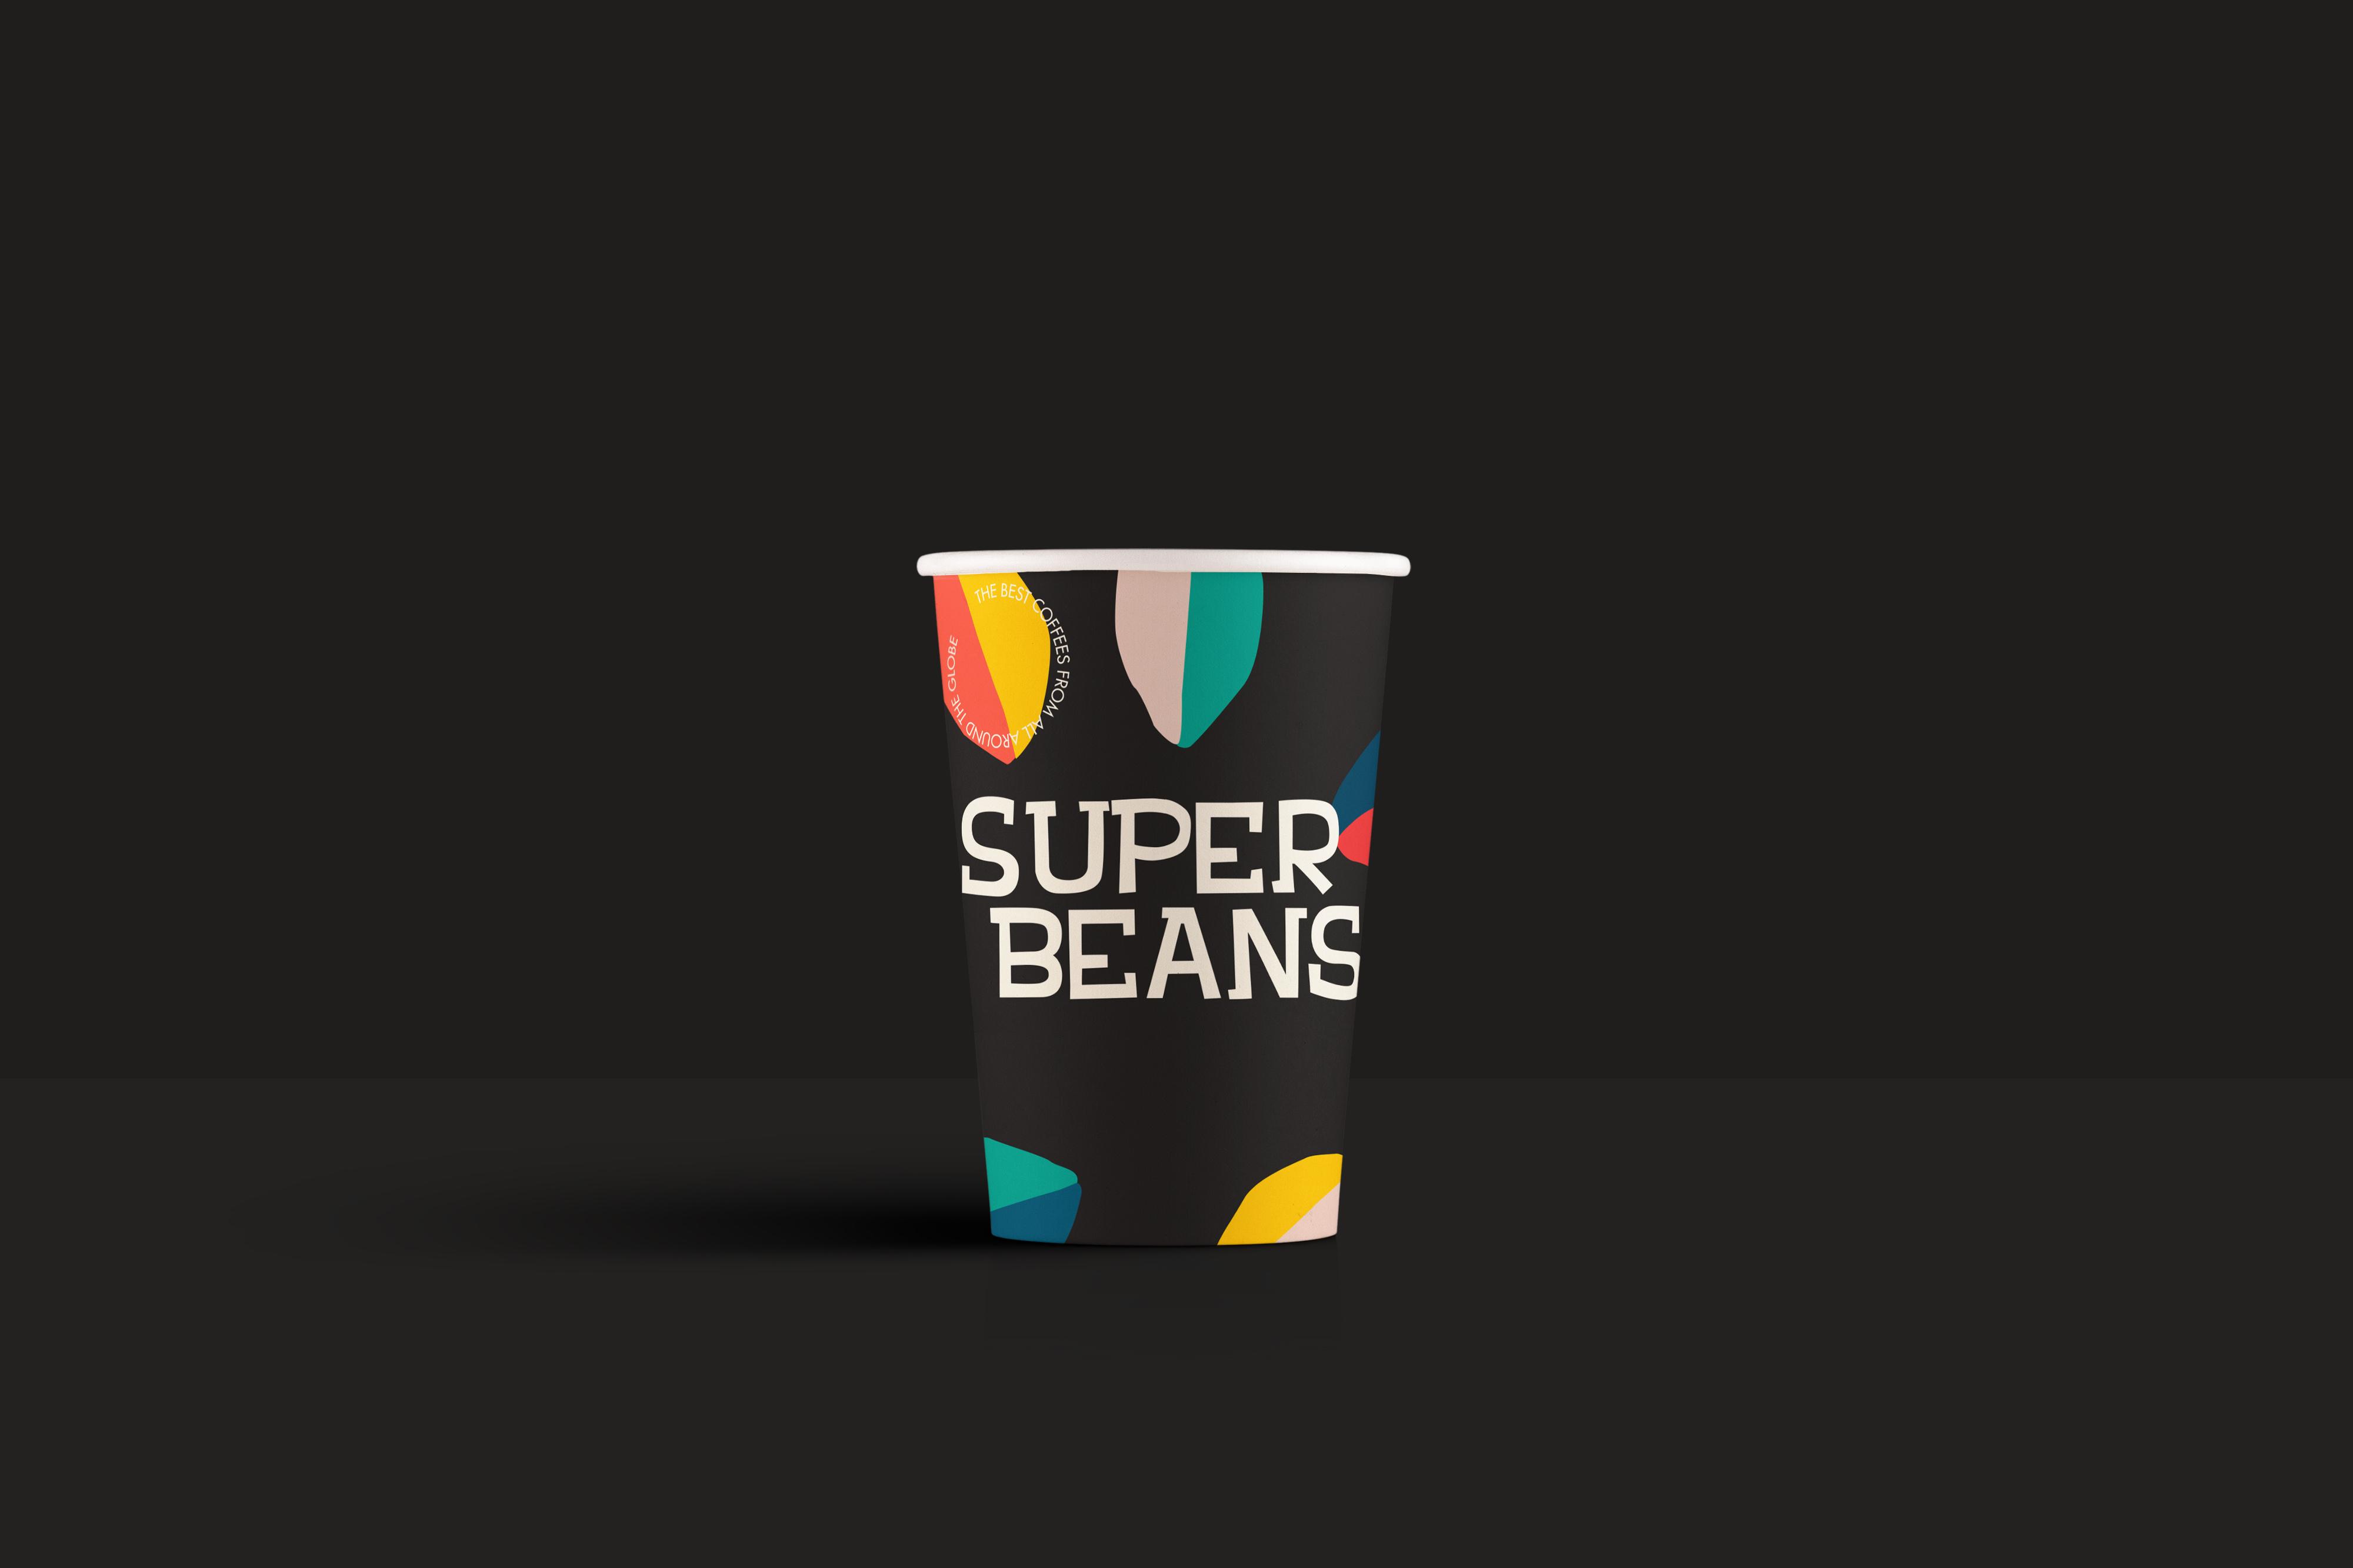 08_SUPERBEANS_PAPERCUP_2